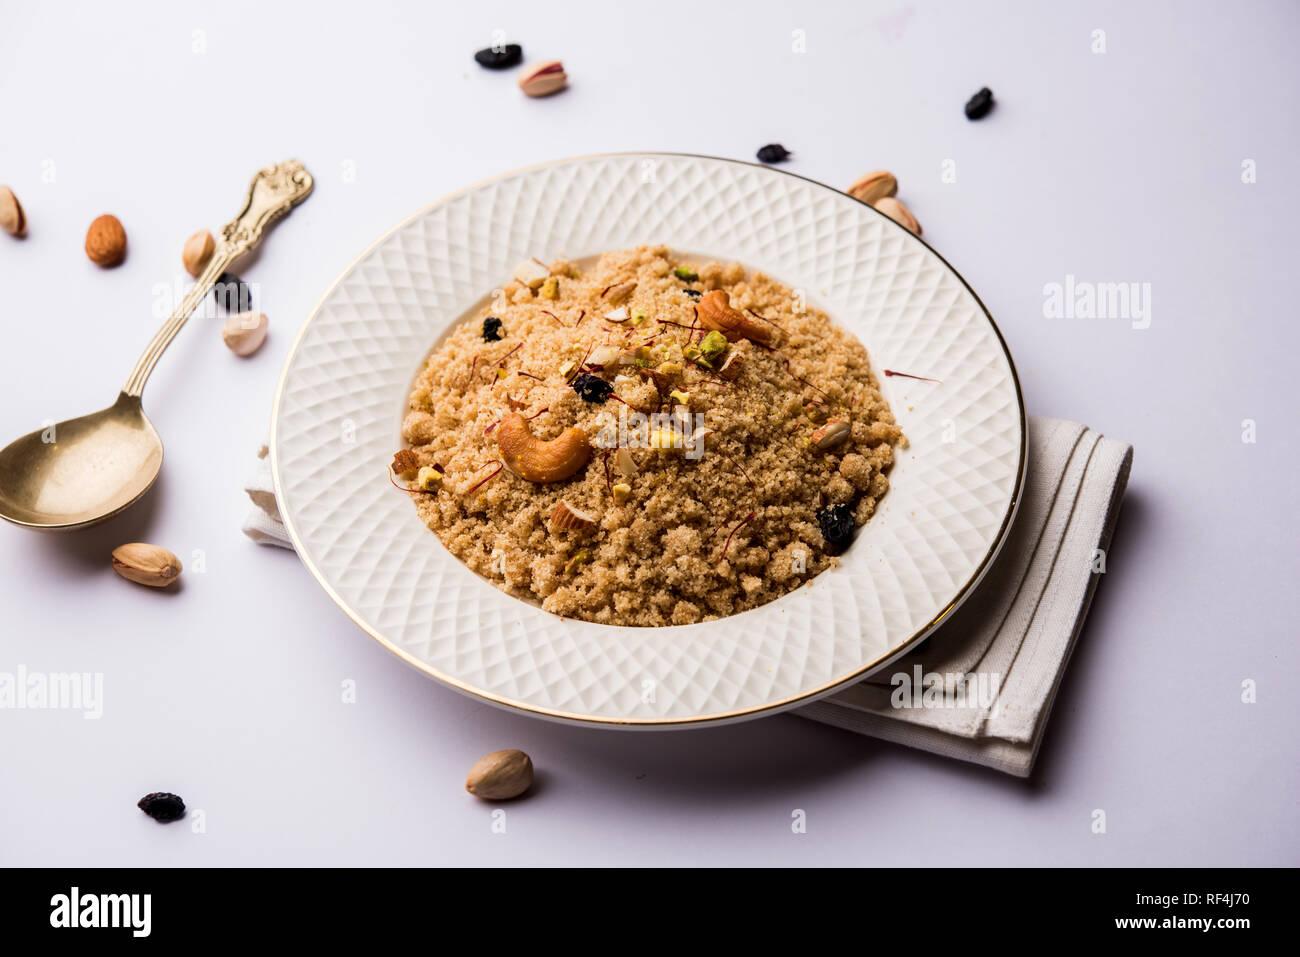 Semolina Halwa / Sooji ka Halva or sweet Rava Sheera or shira - Indian festival sweet made of semolina, nuts and Ghee - Stock Image